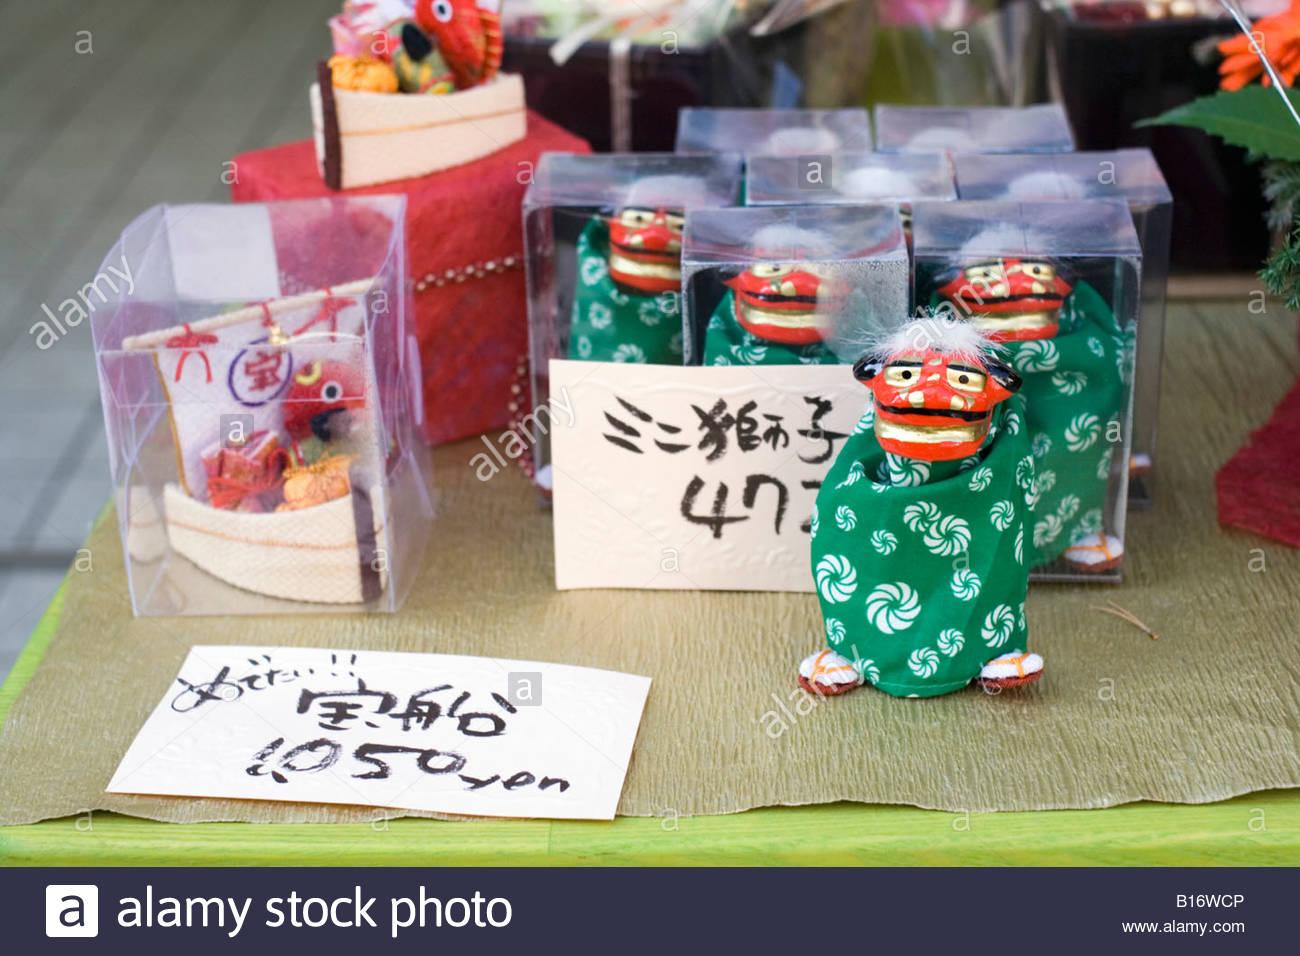 Miniature Shishi-mai lion figures, a symbol of good luck for